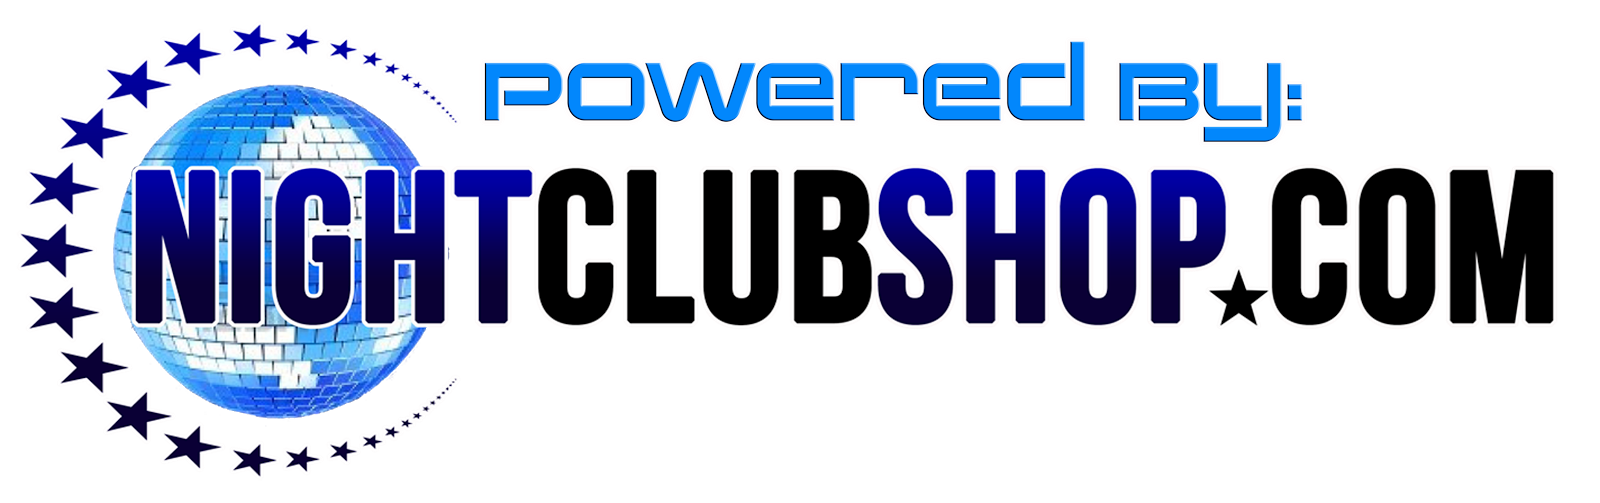 poweredbynightclubshop-solo.png